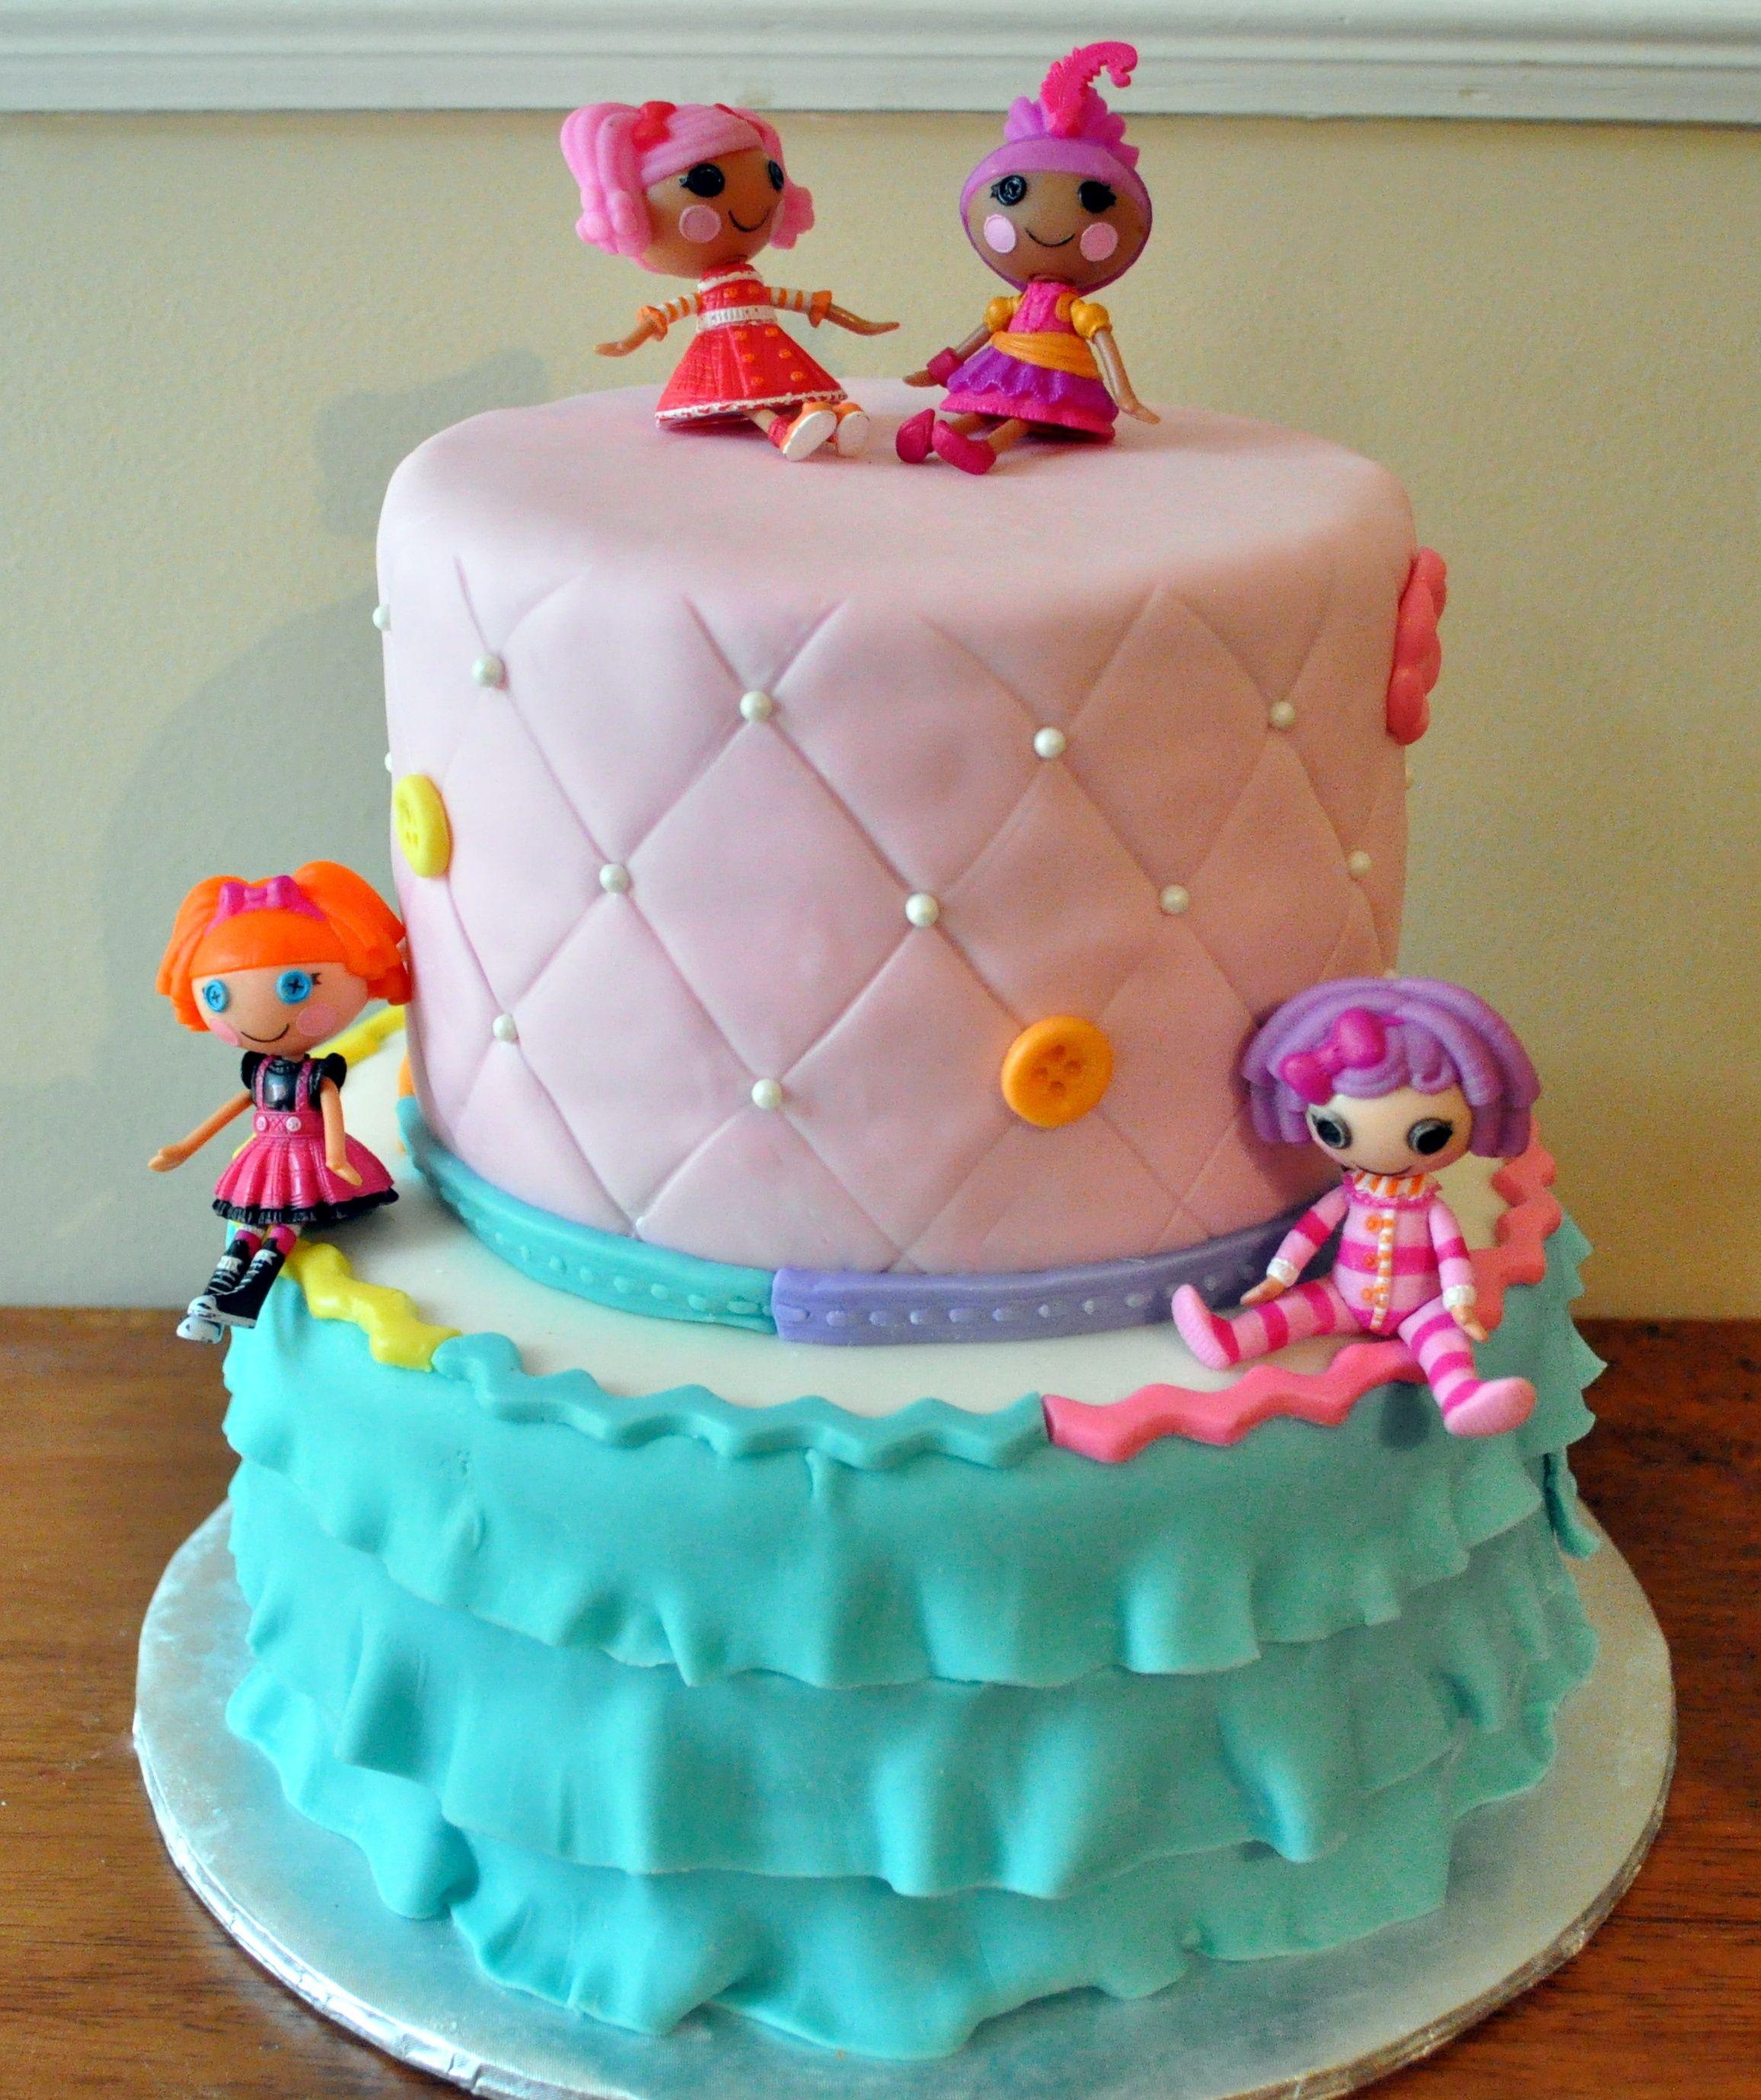 Lalaloopsy cake | Cakes | Pinterest | Lalaloopsy, Cake and Girl cakes